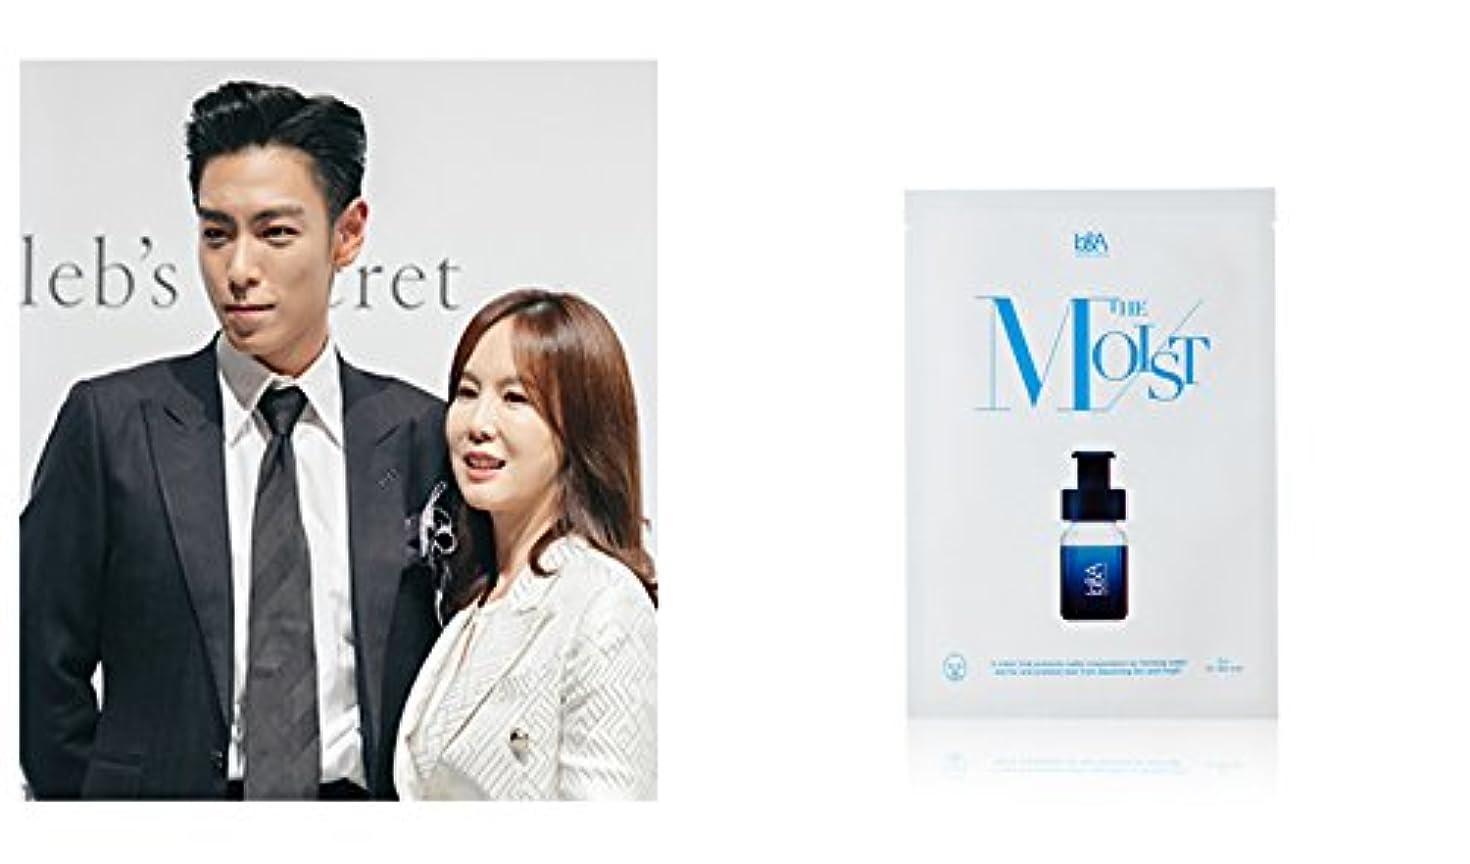 花嫁雑品傾いたBigBang Top [K cosmetic][K beauty] Celeb's-Secret THE MOIST MASK / 5pcs [海外直送品][並行輸入品]